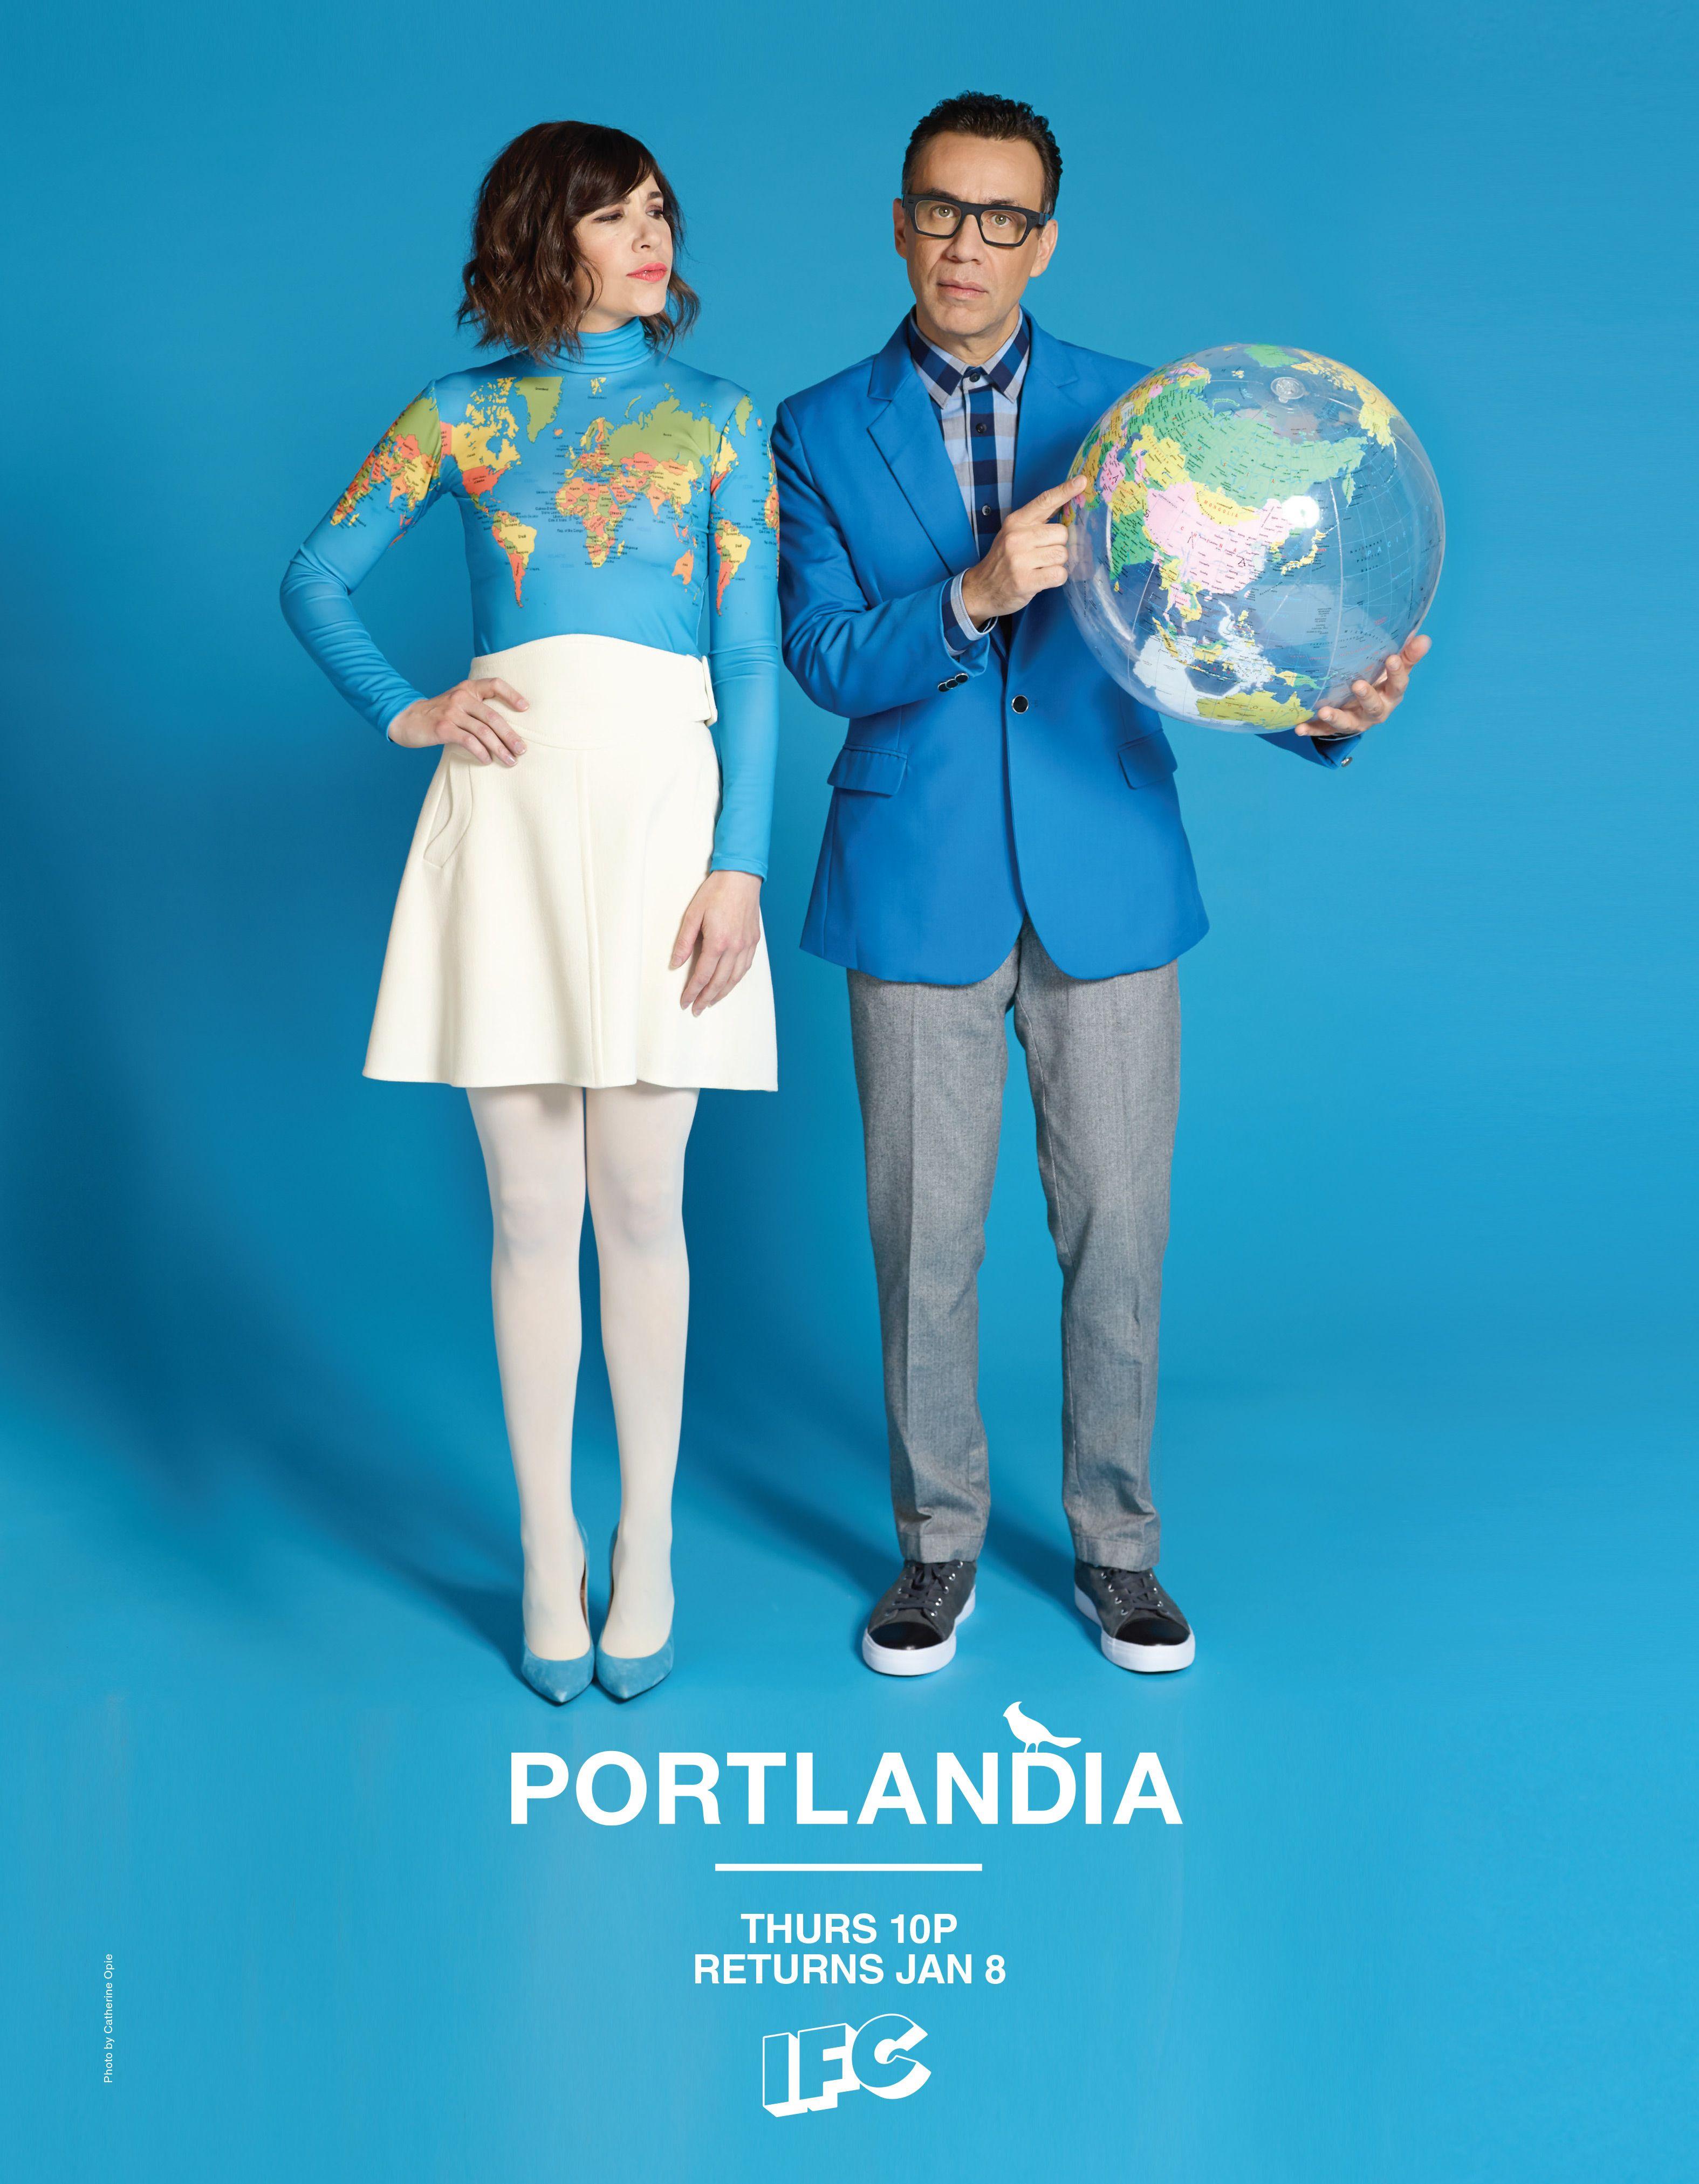 Portlandia\': See the Season 5 Posters (Exclusive)   Dream Closet ...